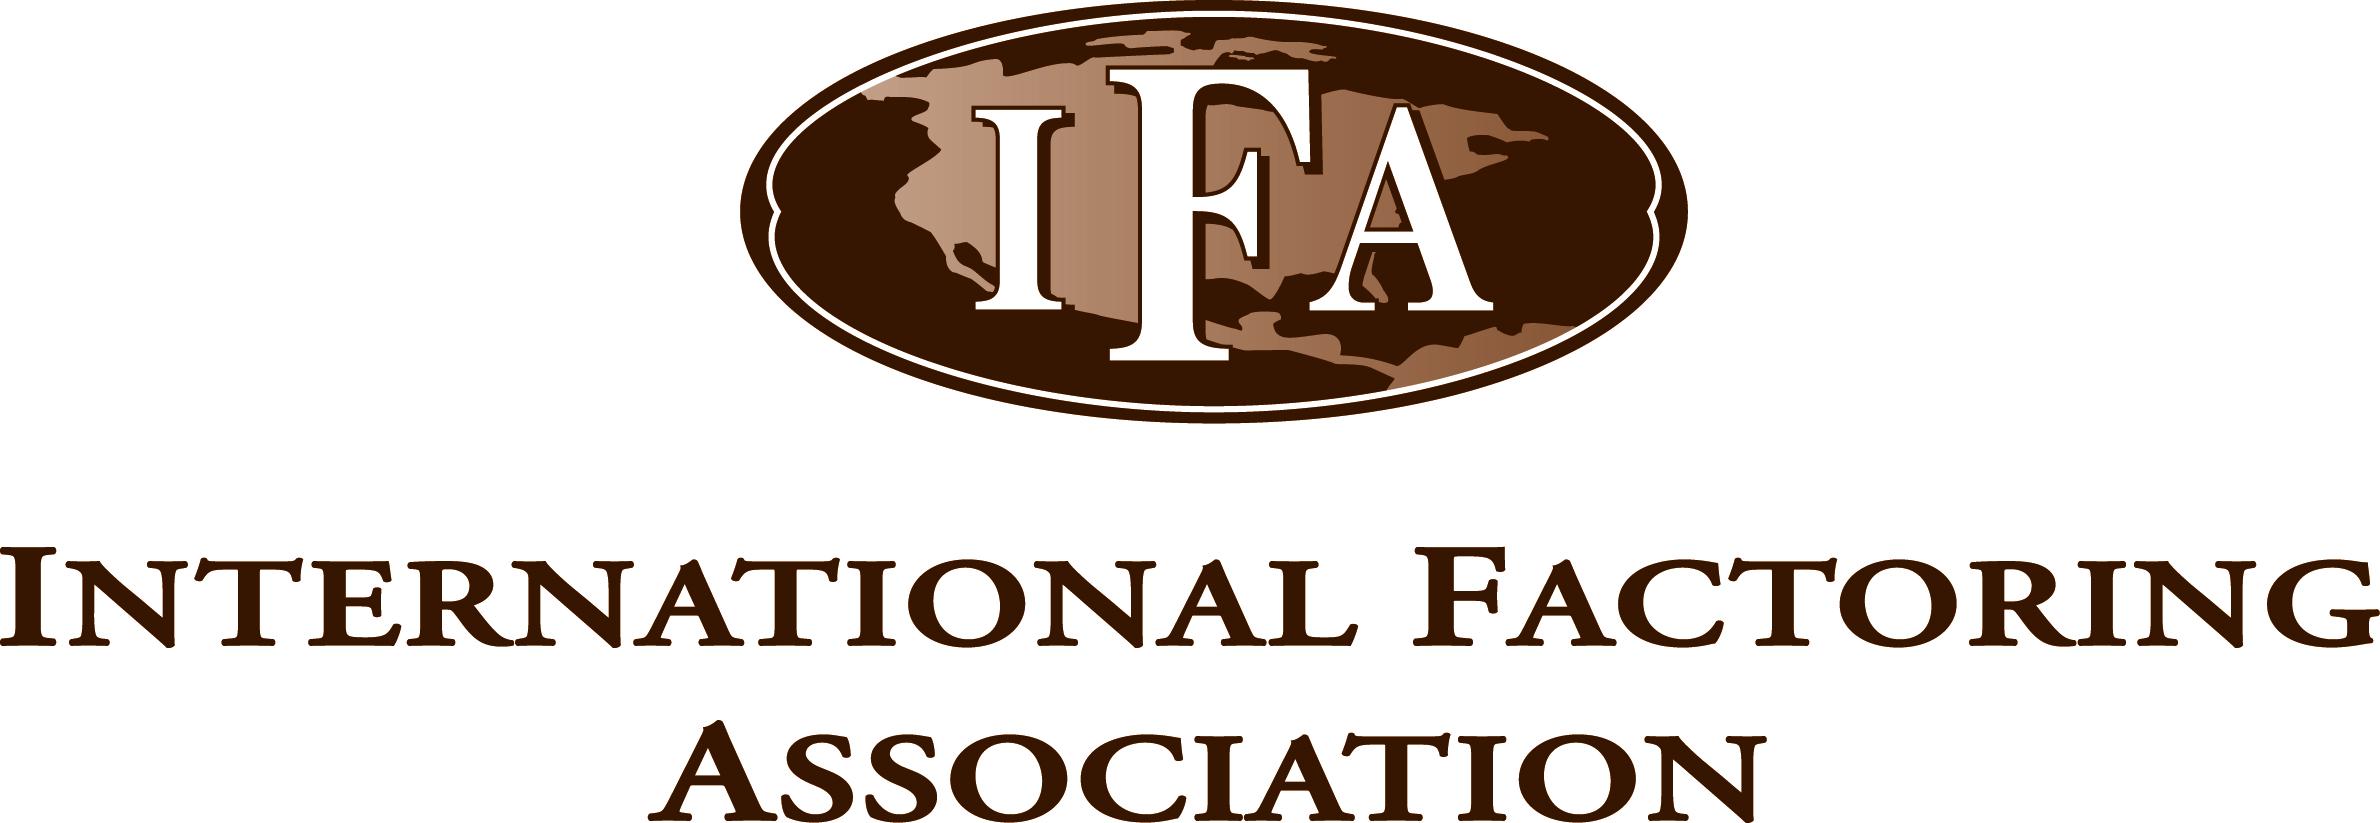 International Factoring Association Badge